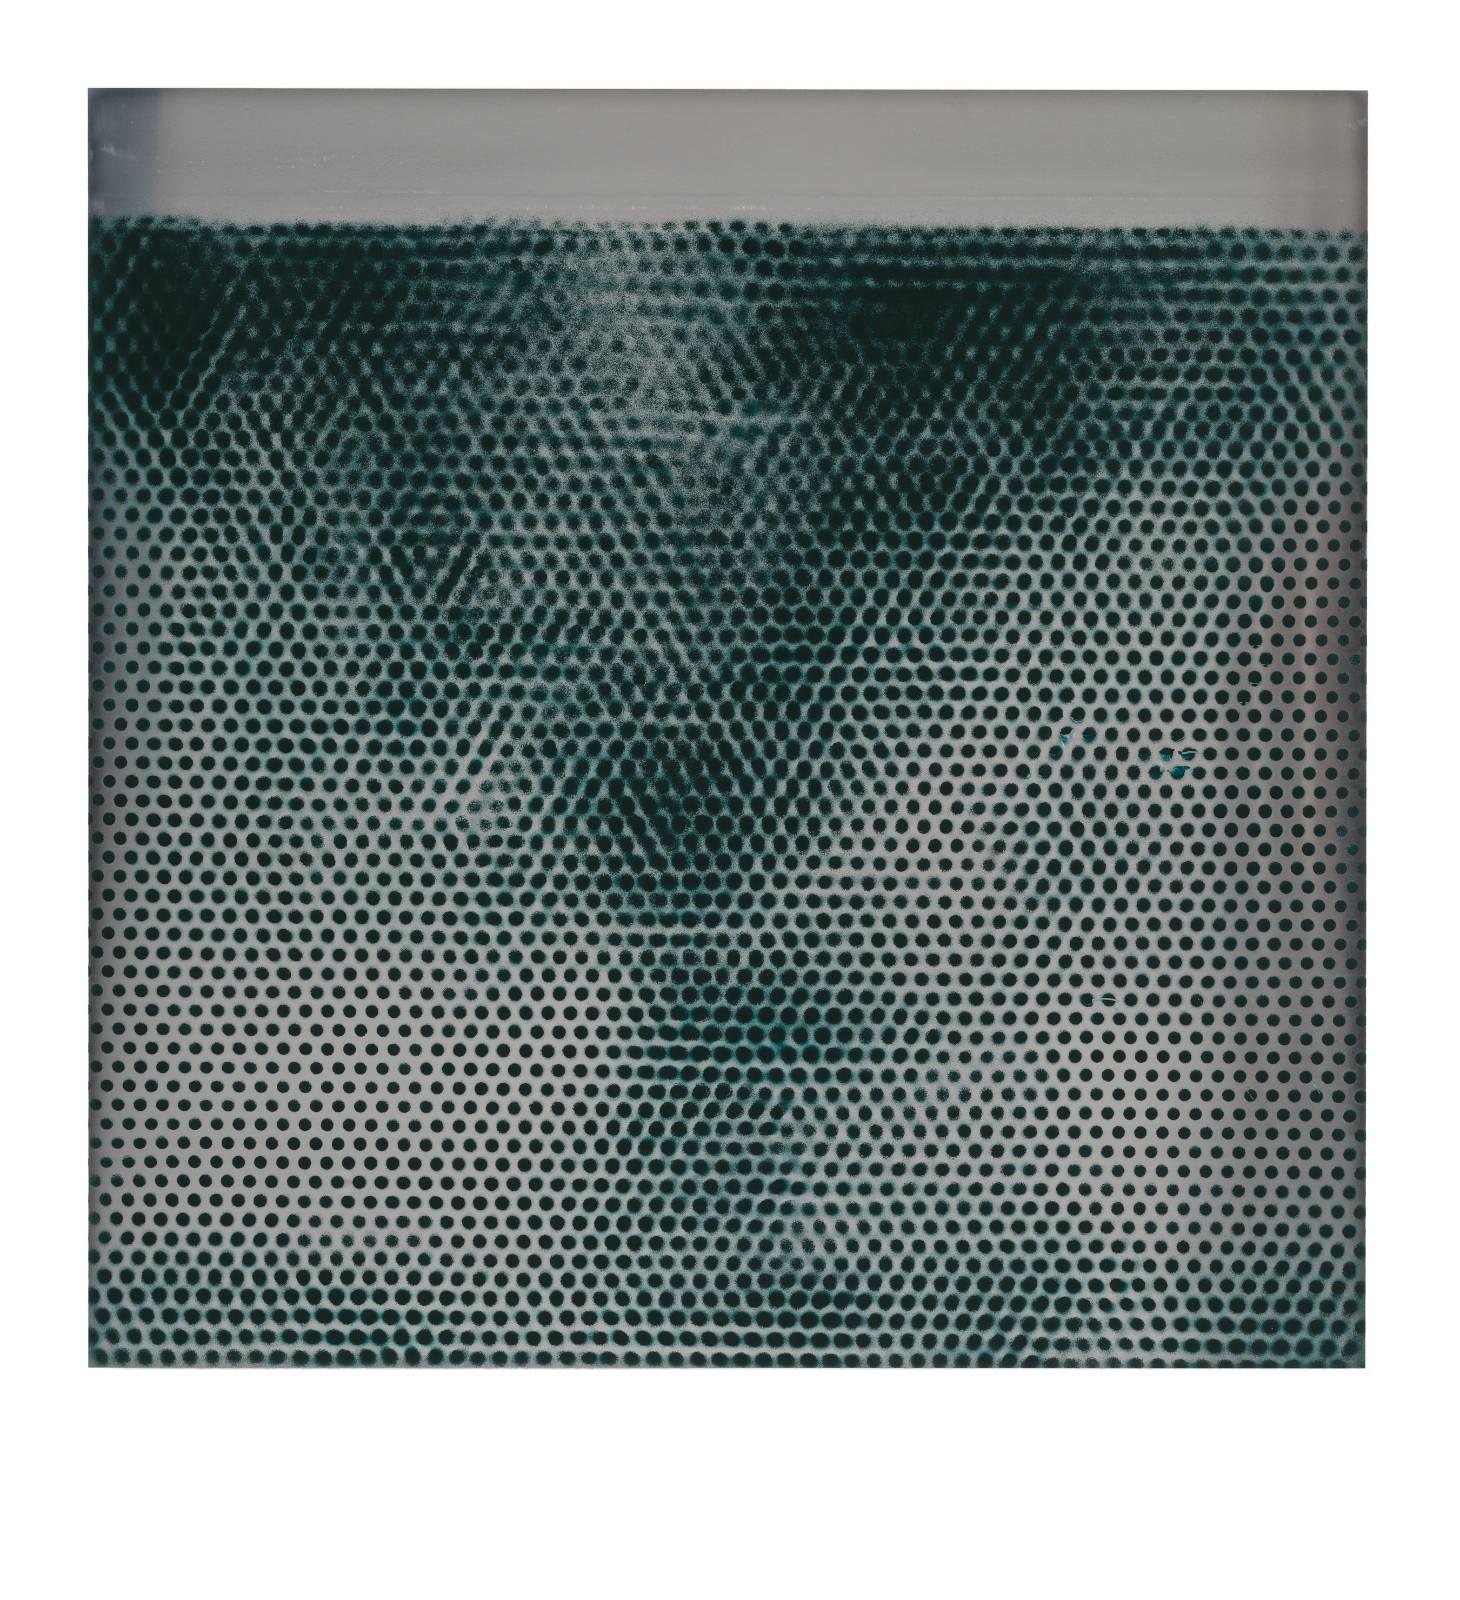 "STAIN : 55°36'37.0""N 12°58'49.1""E, 2016, spraypaint on aluminium, 81,3 x 81,3 cm"